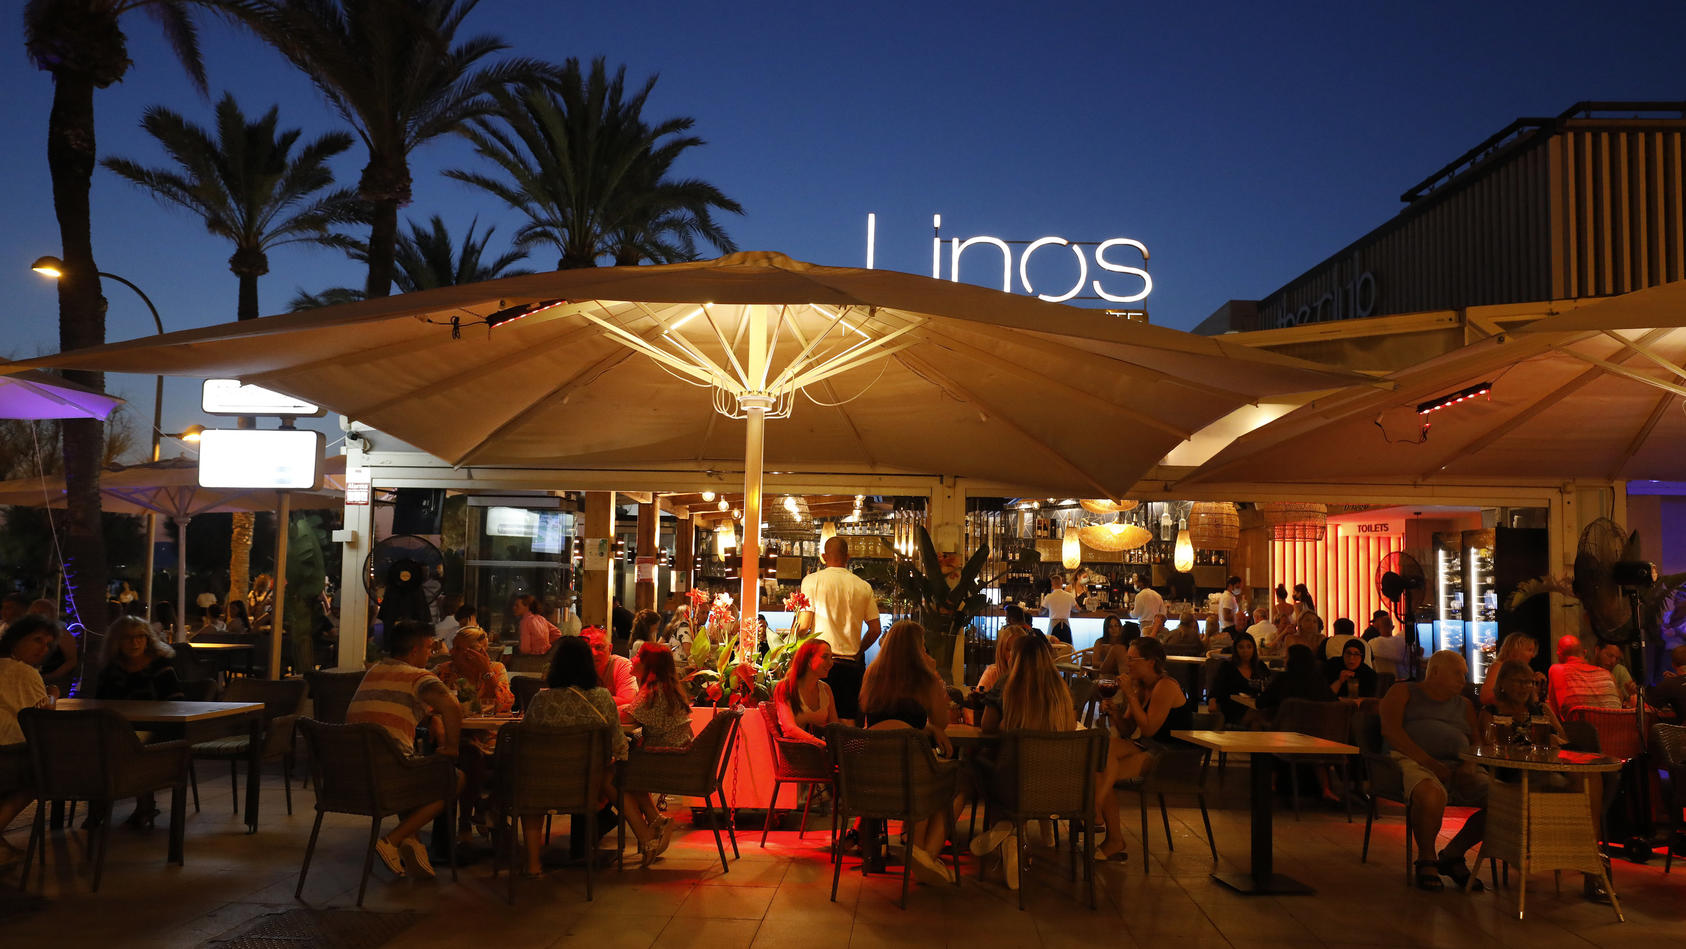 Mallorca lockert Corona-Regeln - das dürfte vor allem Party-Fans freuen.